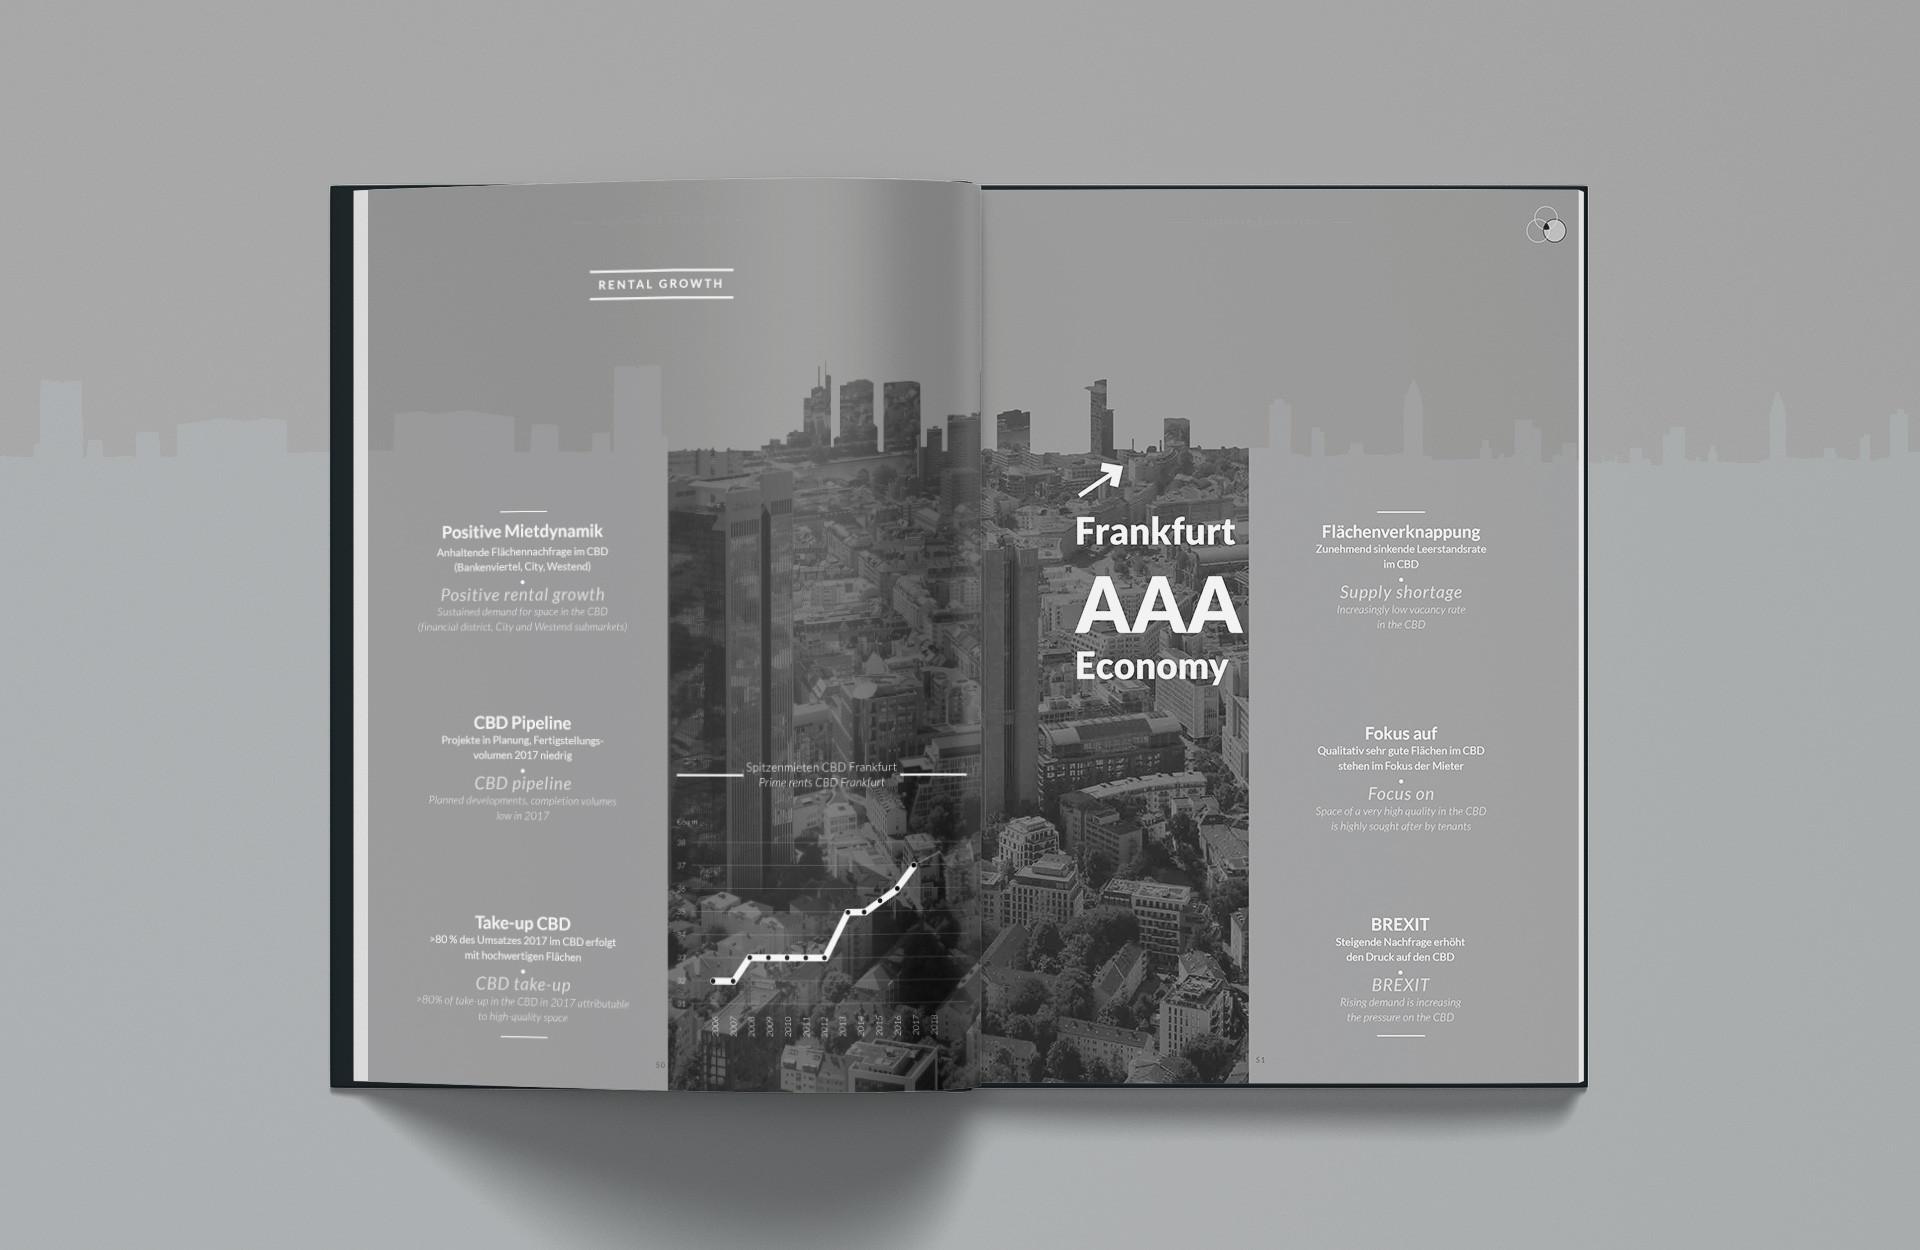 Savills_FiftyAvon_Seite_50-51_brochure-a